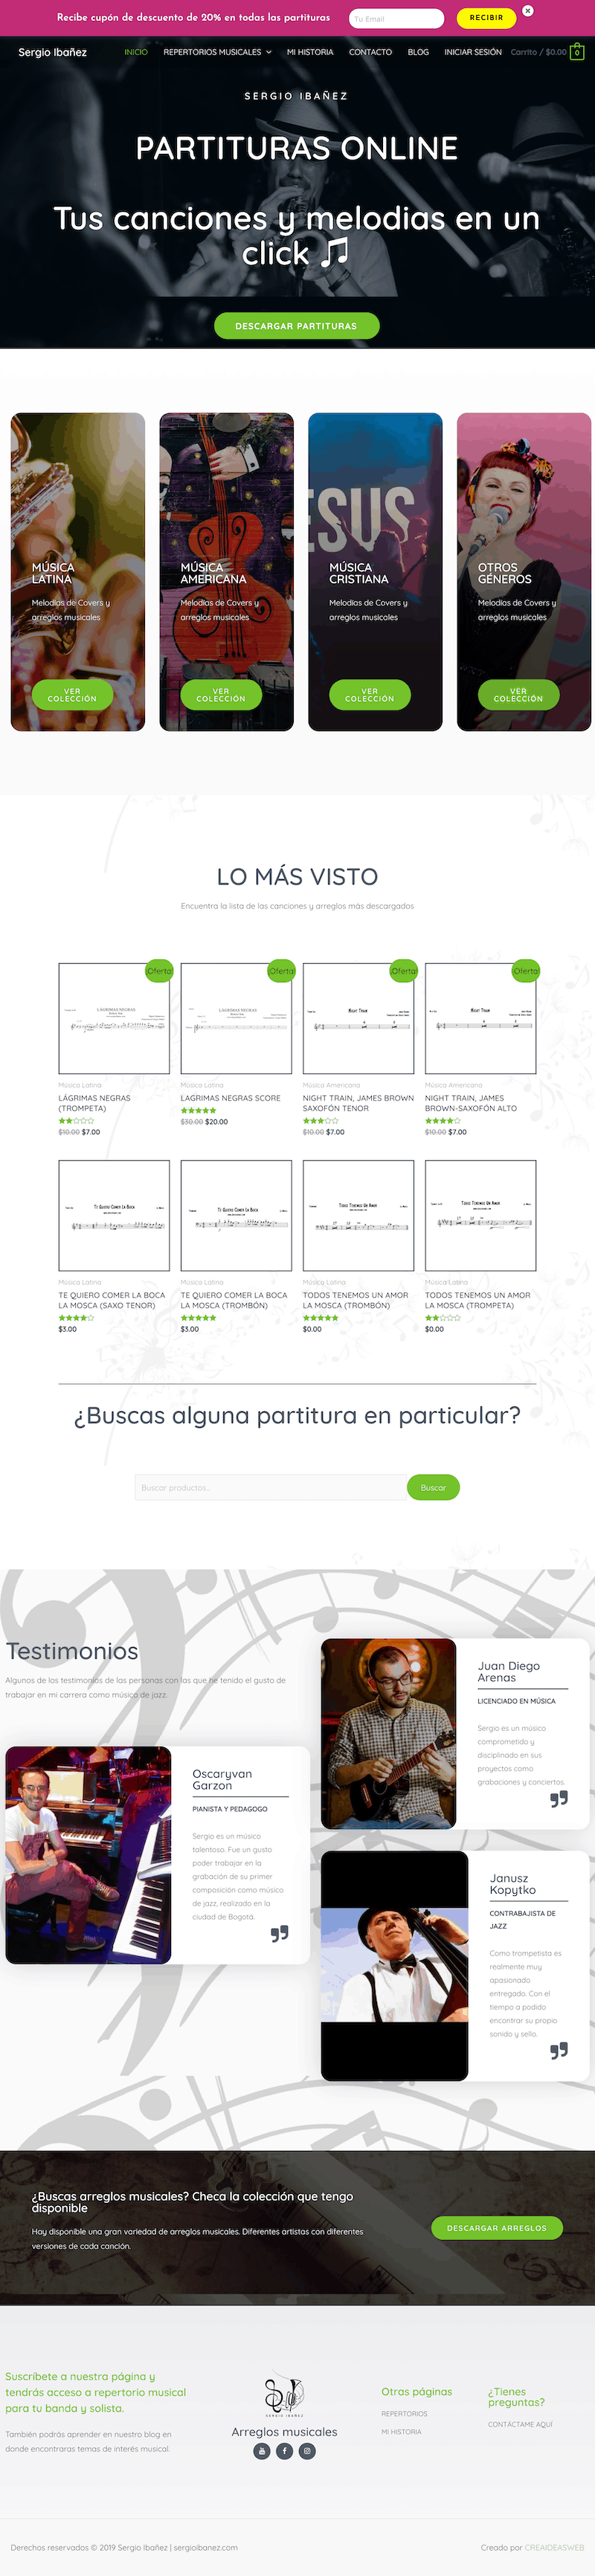 website design for eCommerce business